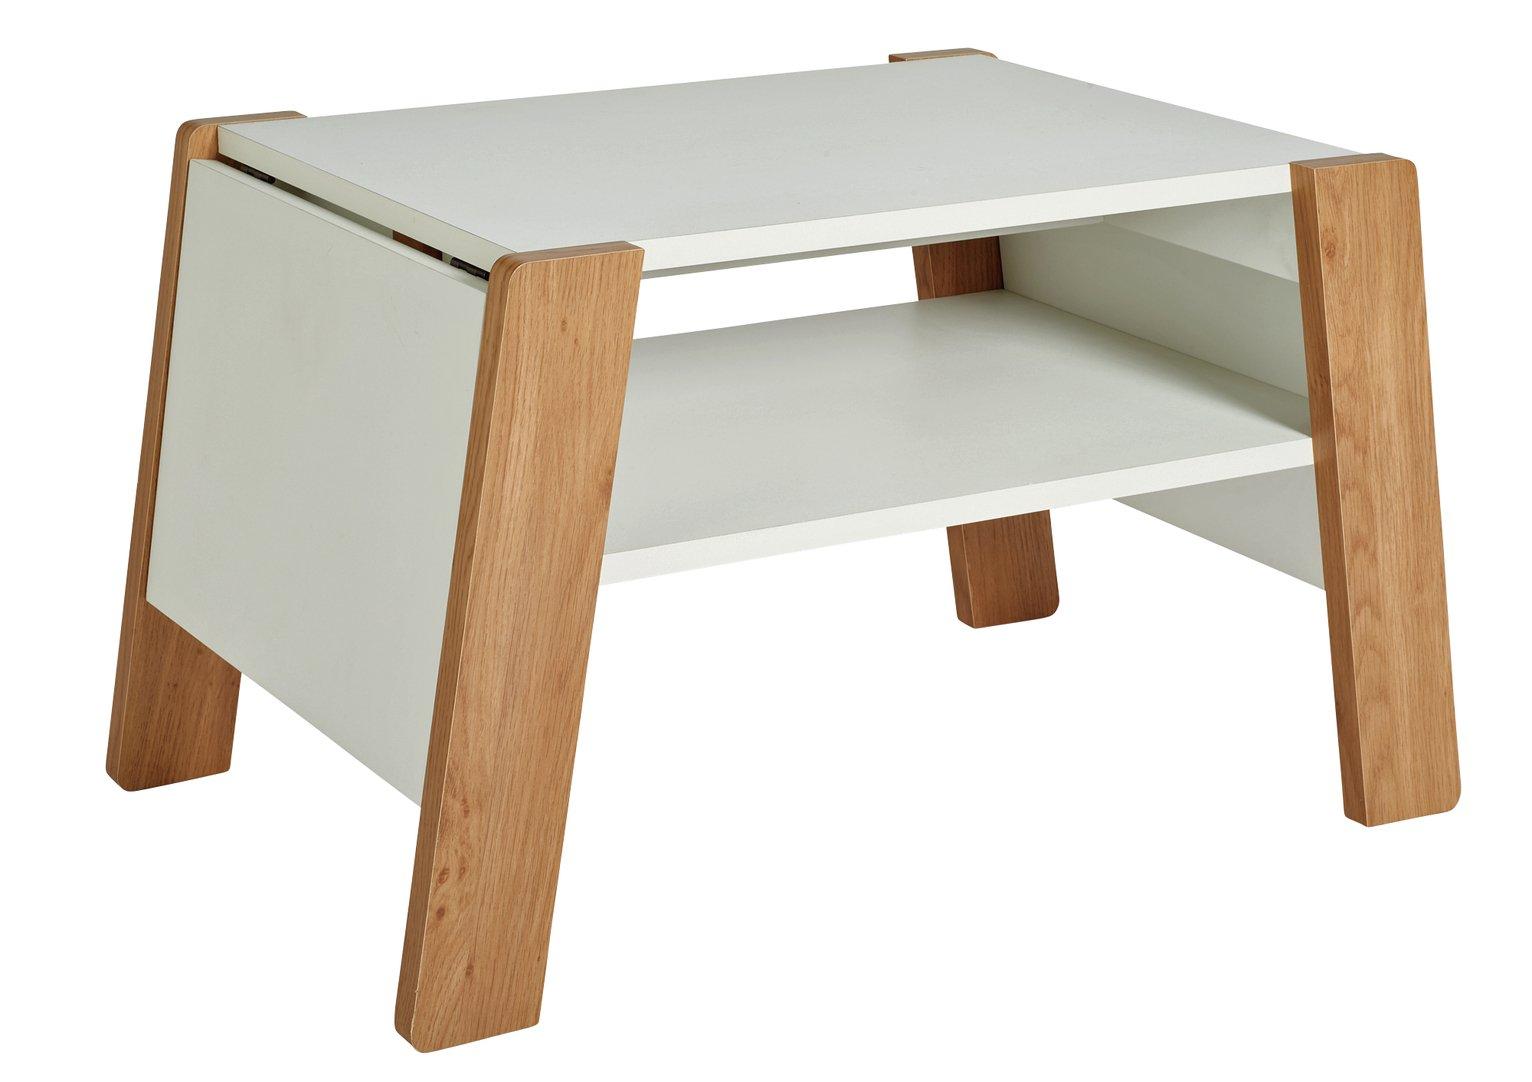 Buy Habitat Kilo Nest of 3 Tables White Coffee tables side